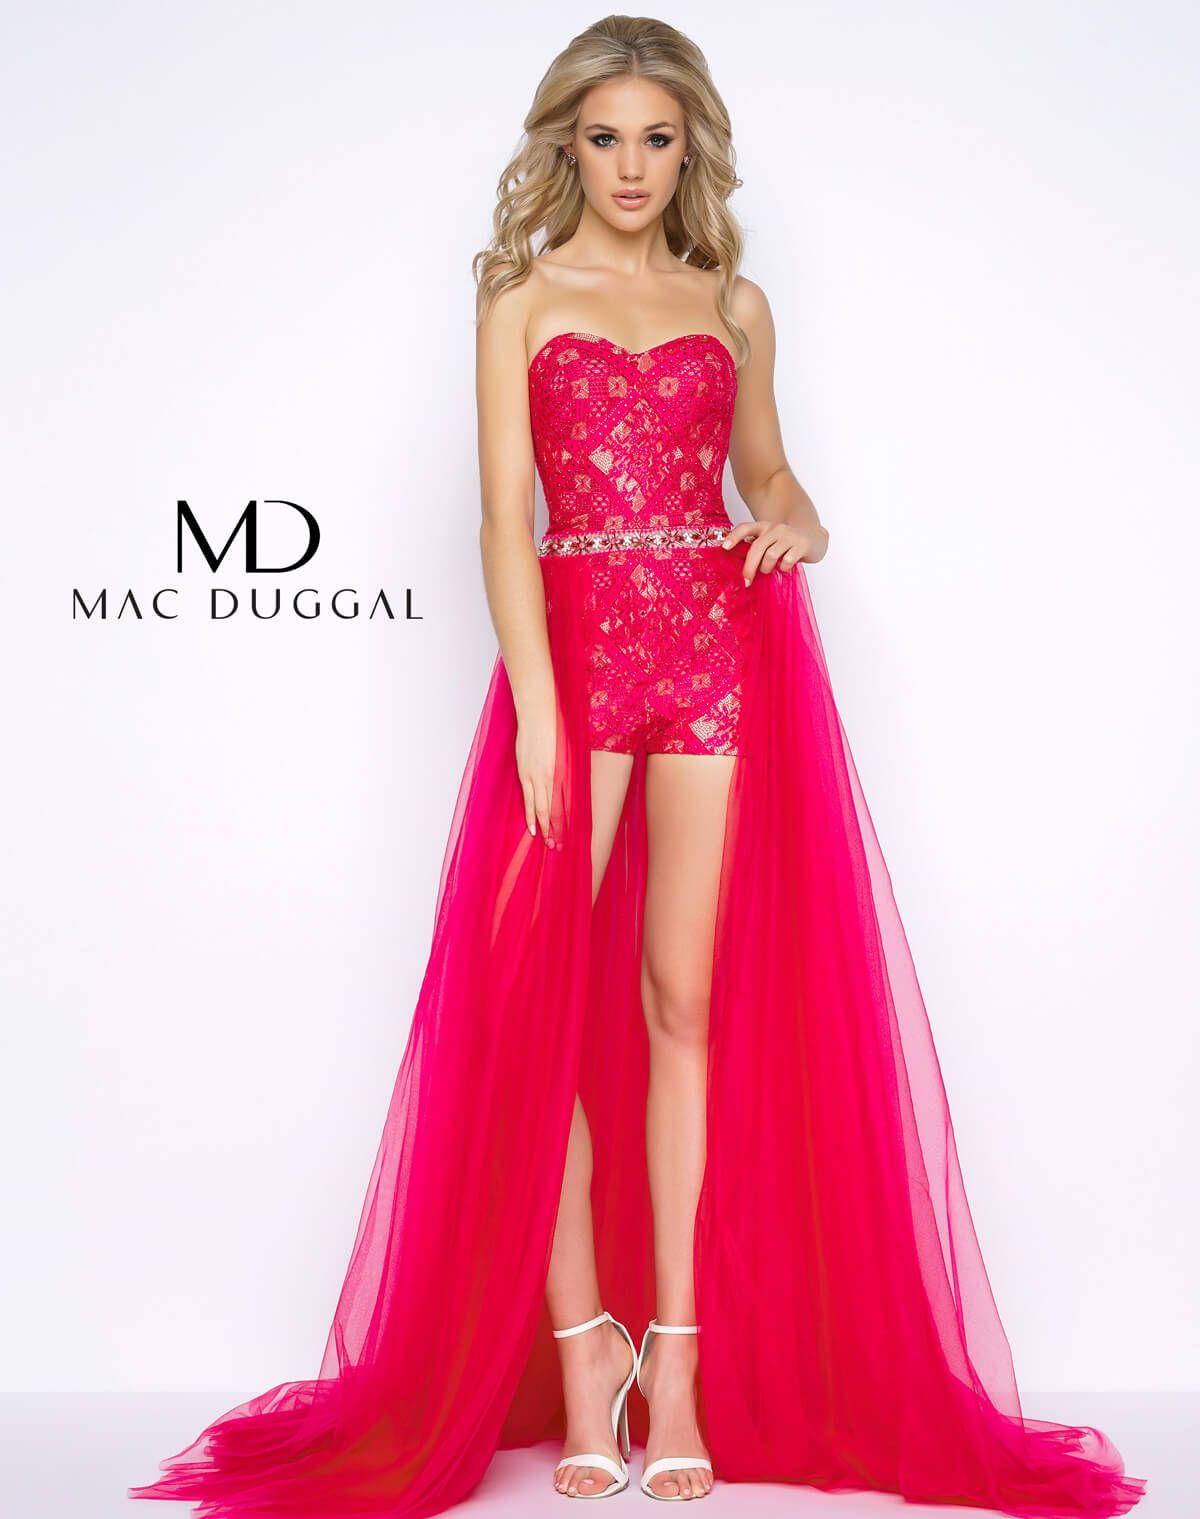 50366a Mac Duggal Homecoming Dresses Dresses Prom Romper [ 1519 x 1200 Pixel ]